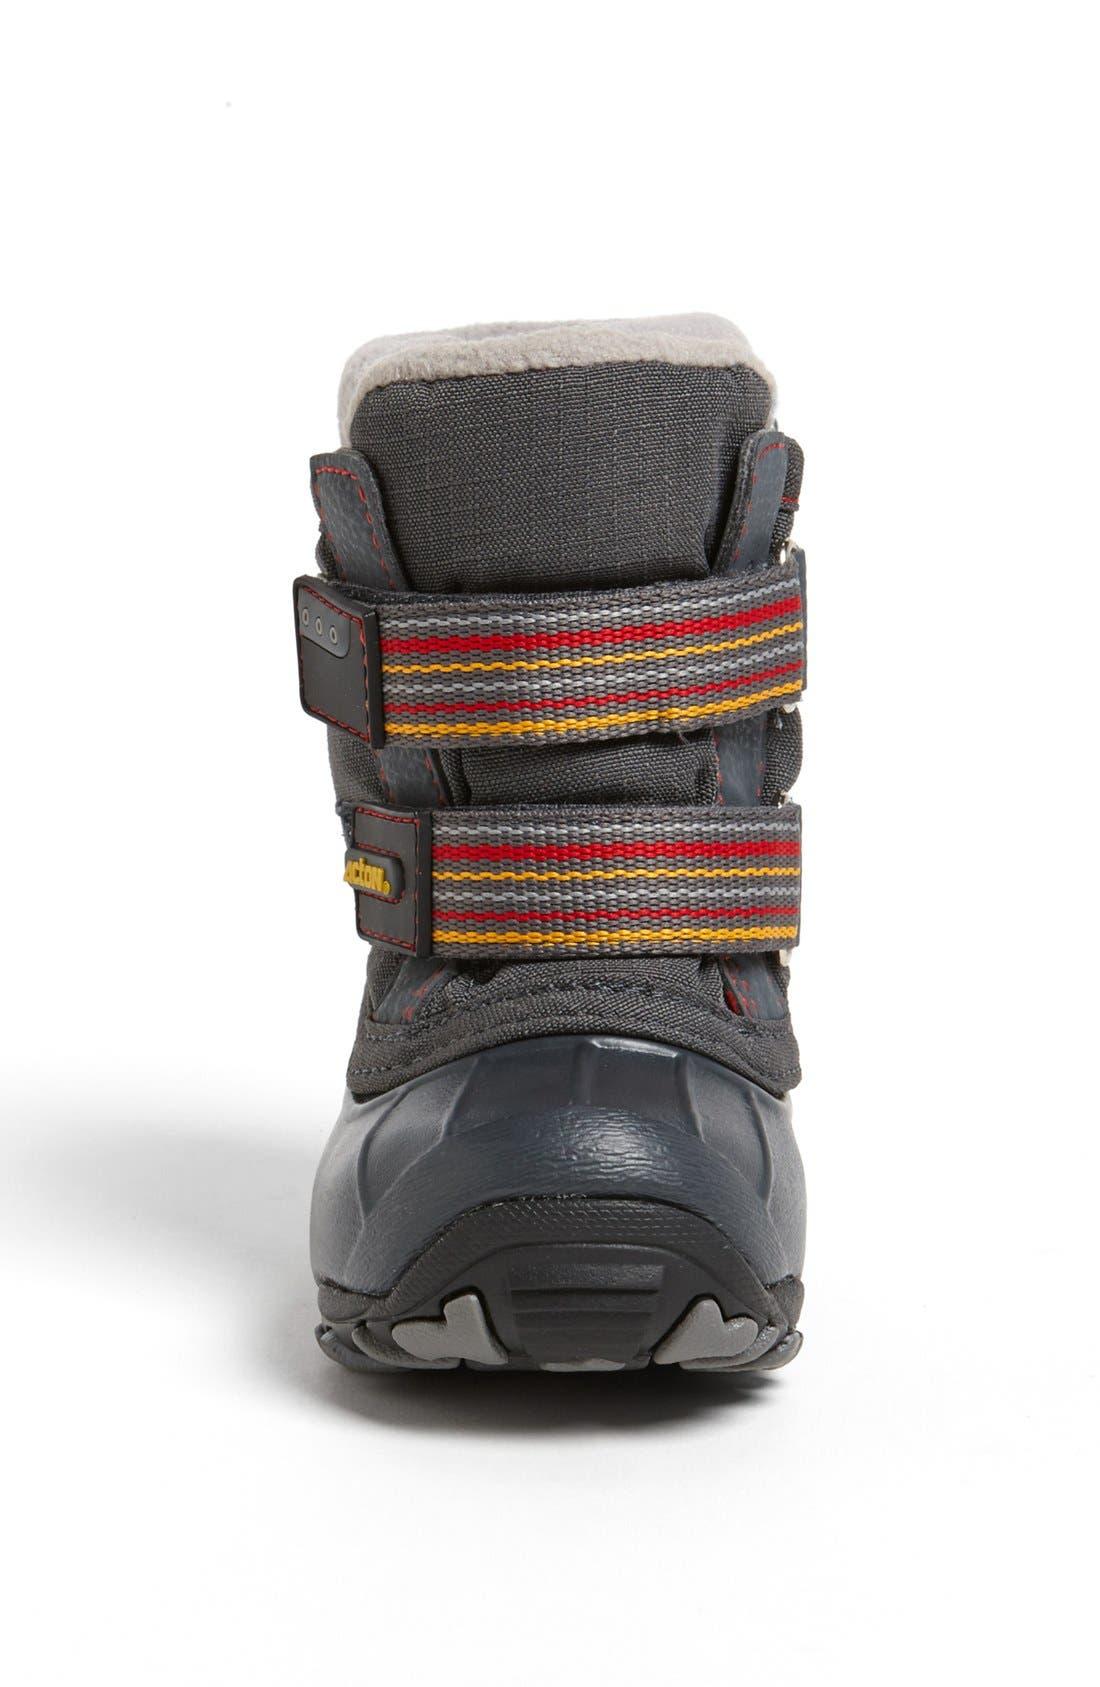 Alternate Image 3  - Acton 'Lullaby' Waterproof Winter Boot (Walker & Toddler)